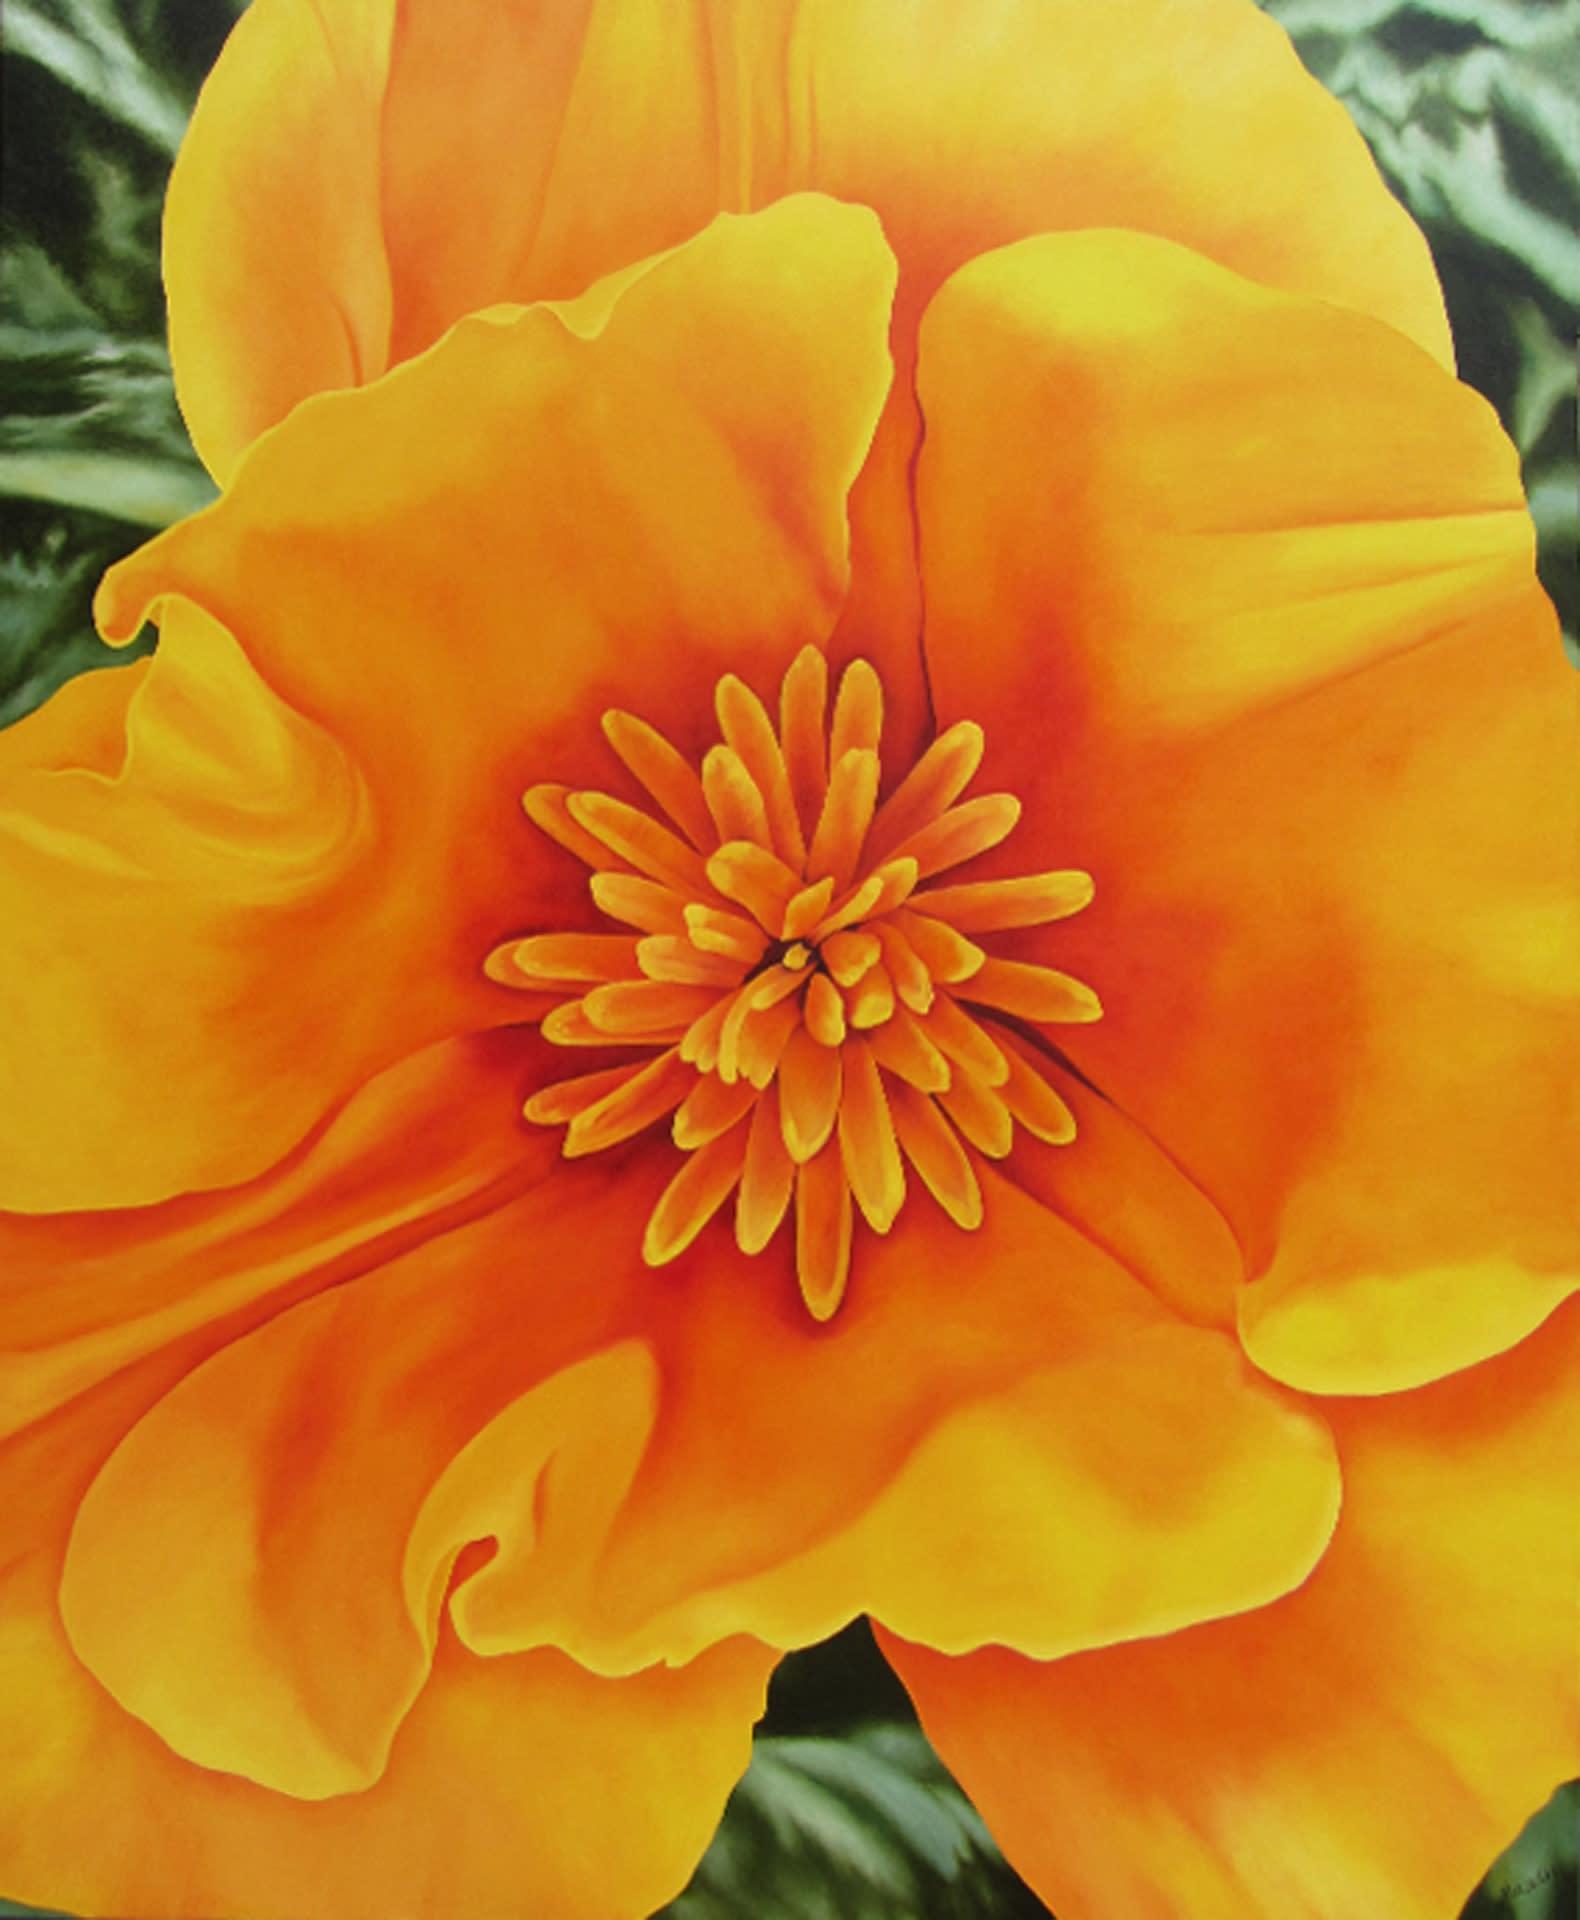 Happy california poppy 66hx54w oil 72dpi 1920pxh nqhtz7